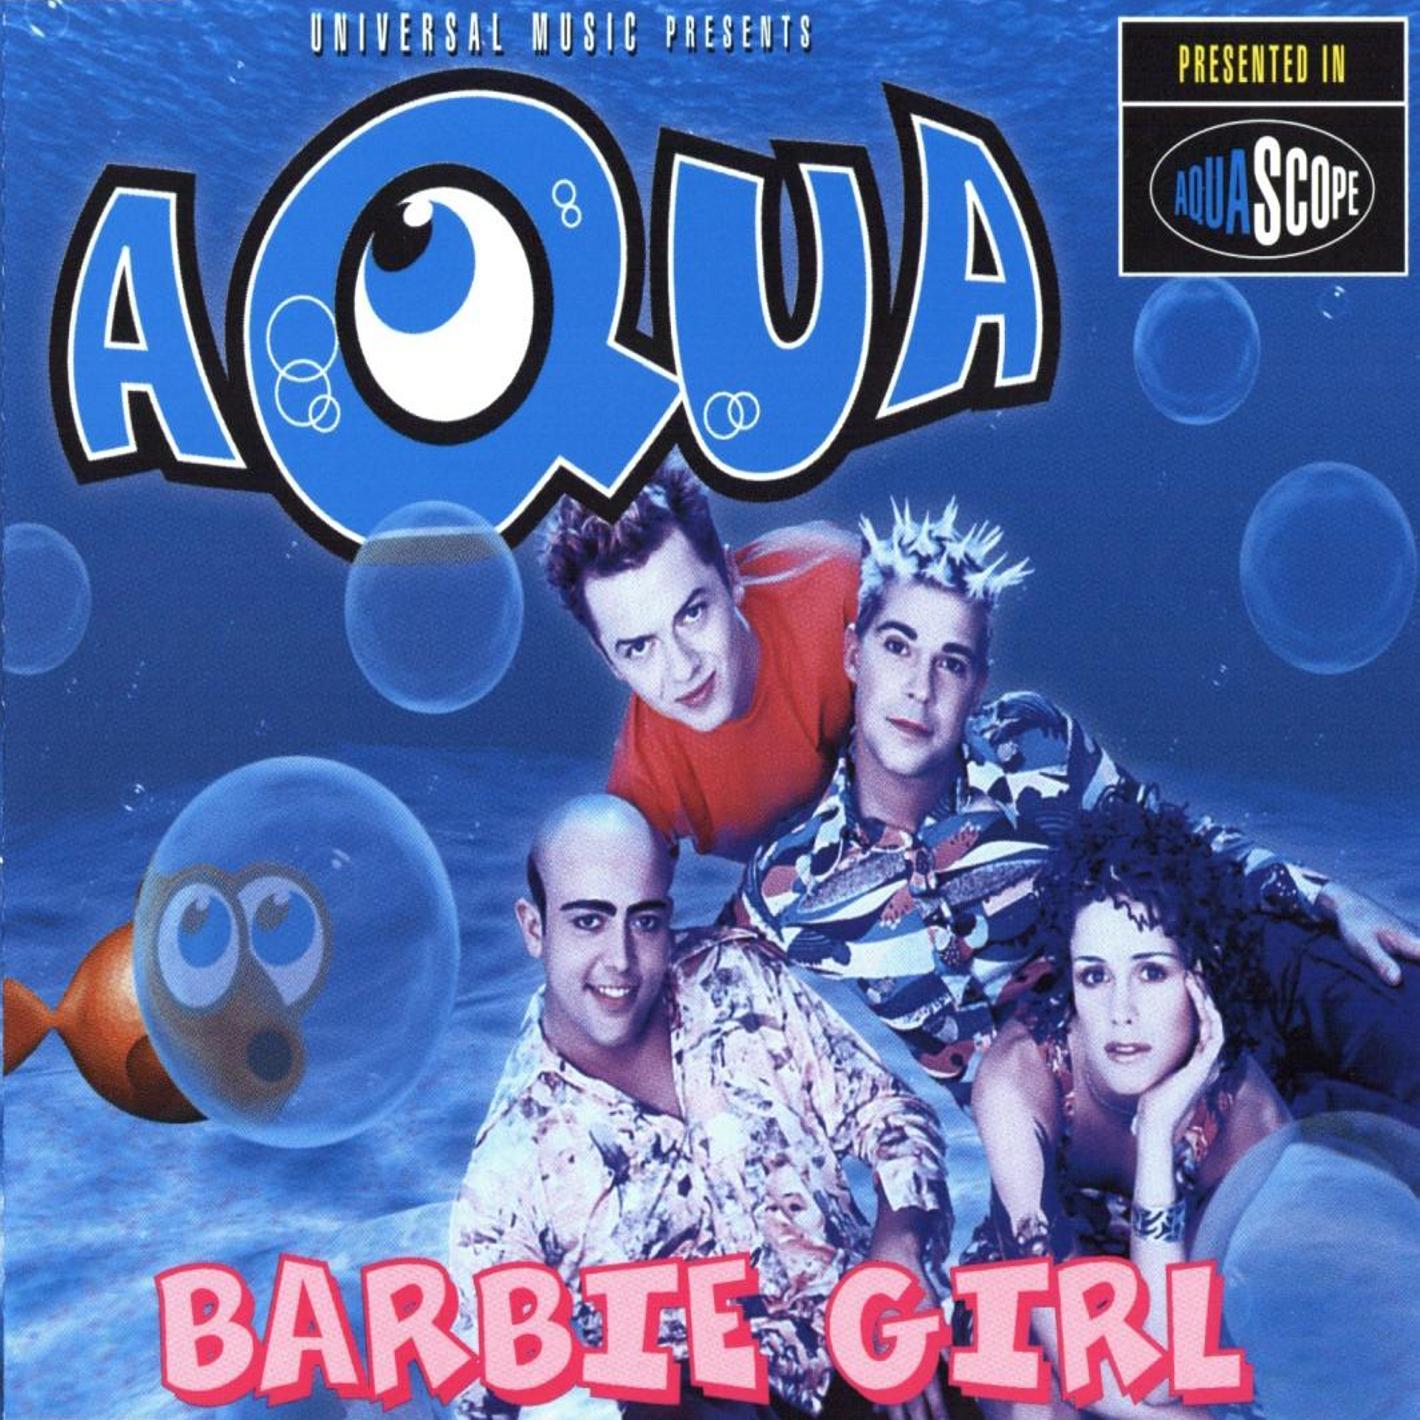 acua barbie girl copertina disco